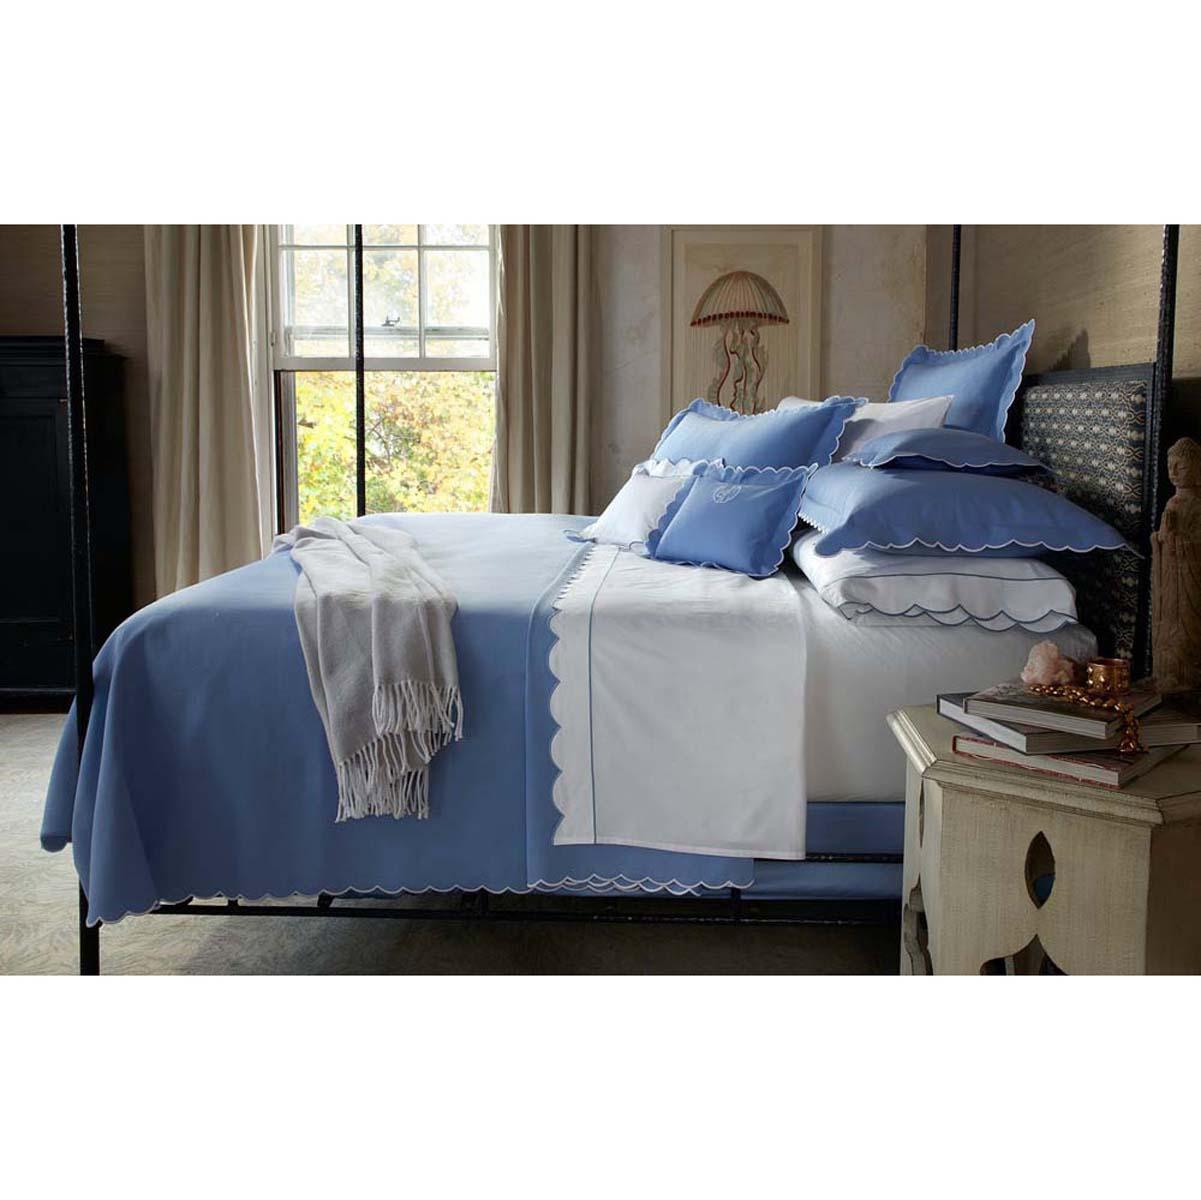 Perfect Diamond Pique Luxury Bed Linens By Matouk